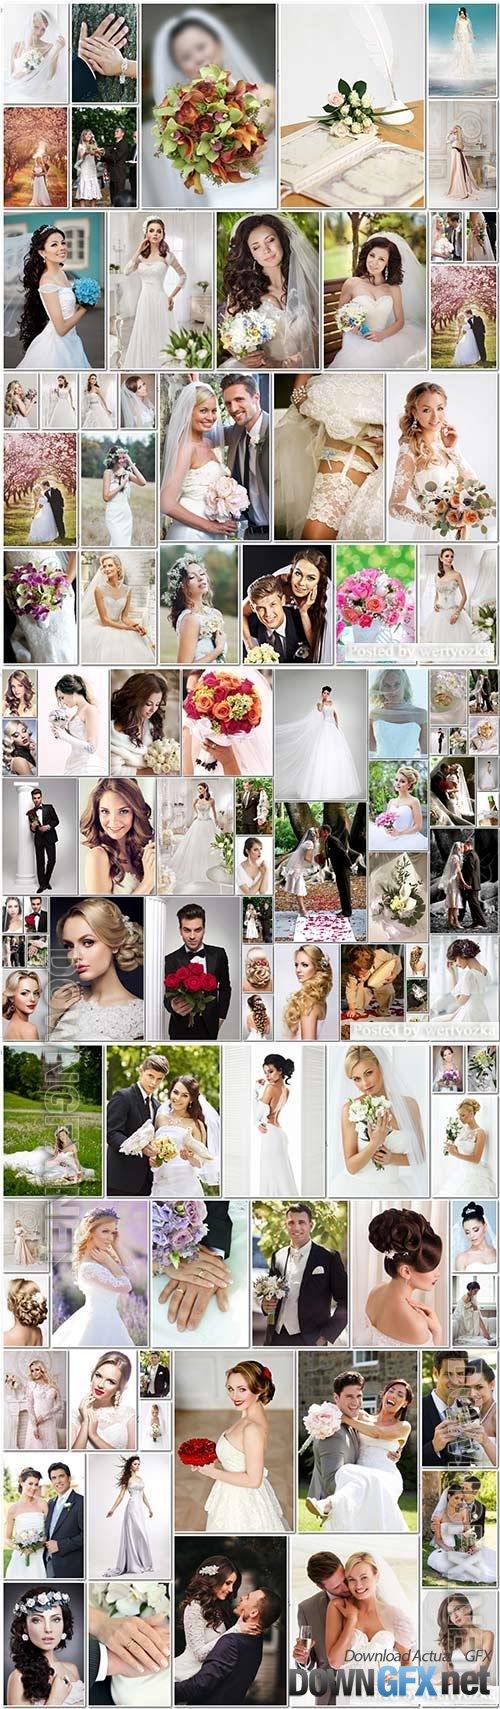 100 Bundle beautiful bride and groom, wedding stock photo vol 1